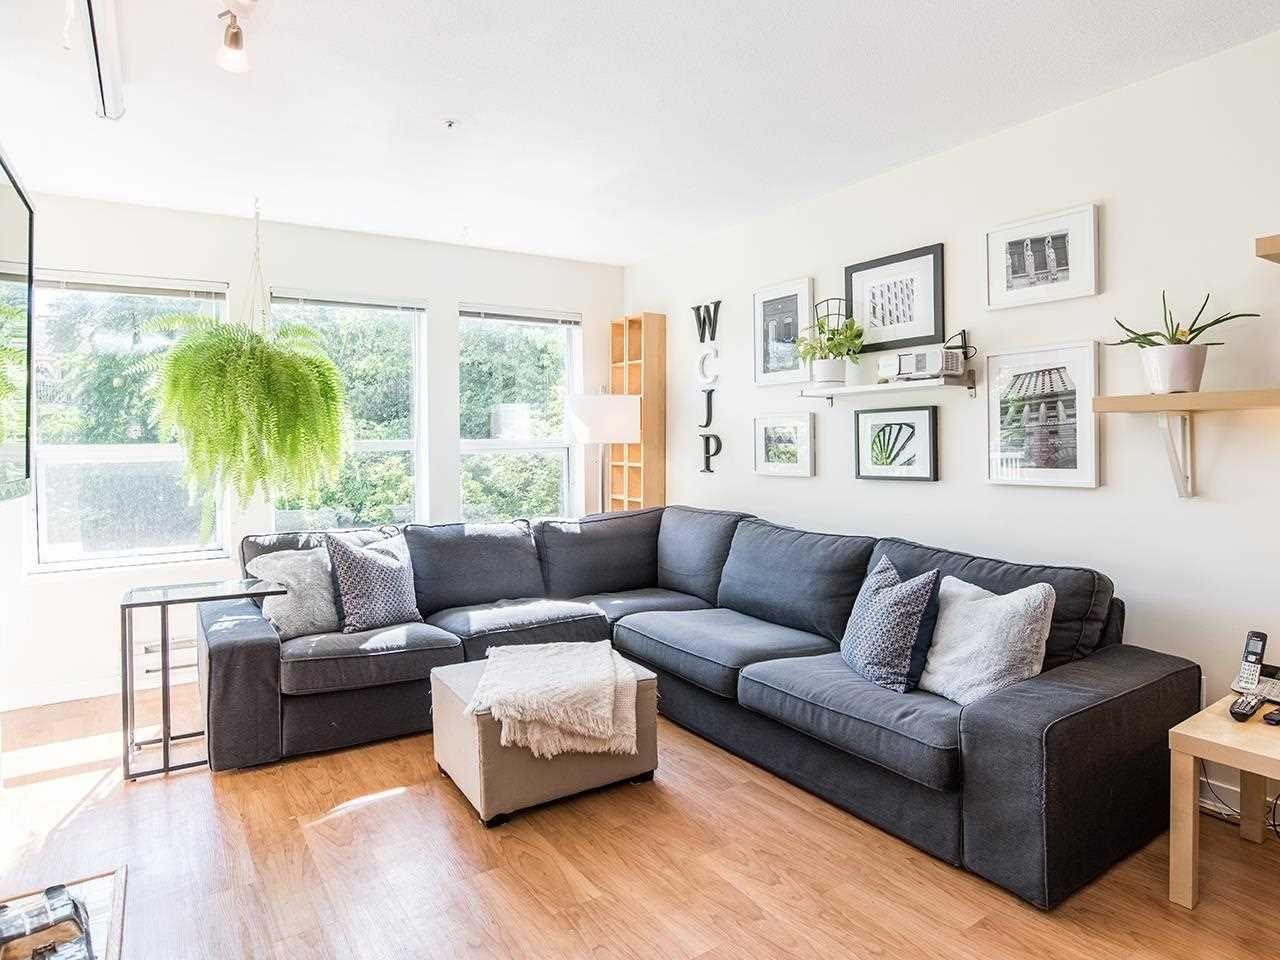 9688-148-street-guildford-north-surrey-03 at 306 - 9688 148 Street, Guildford, North Surrey